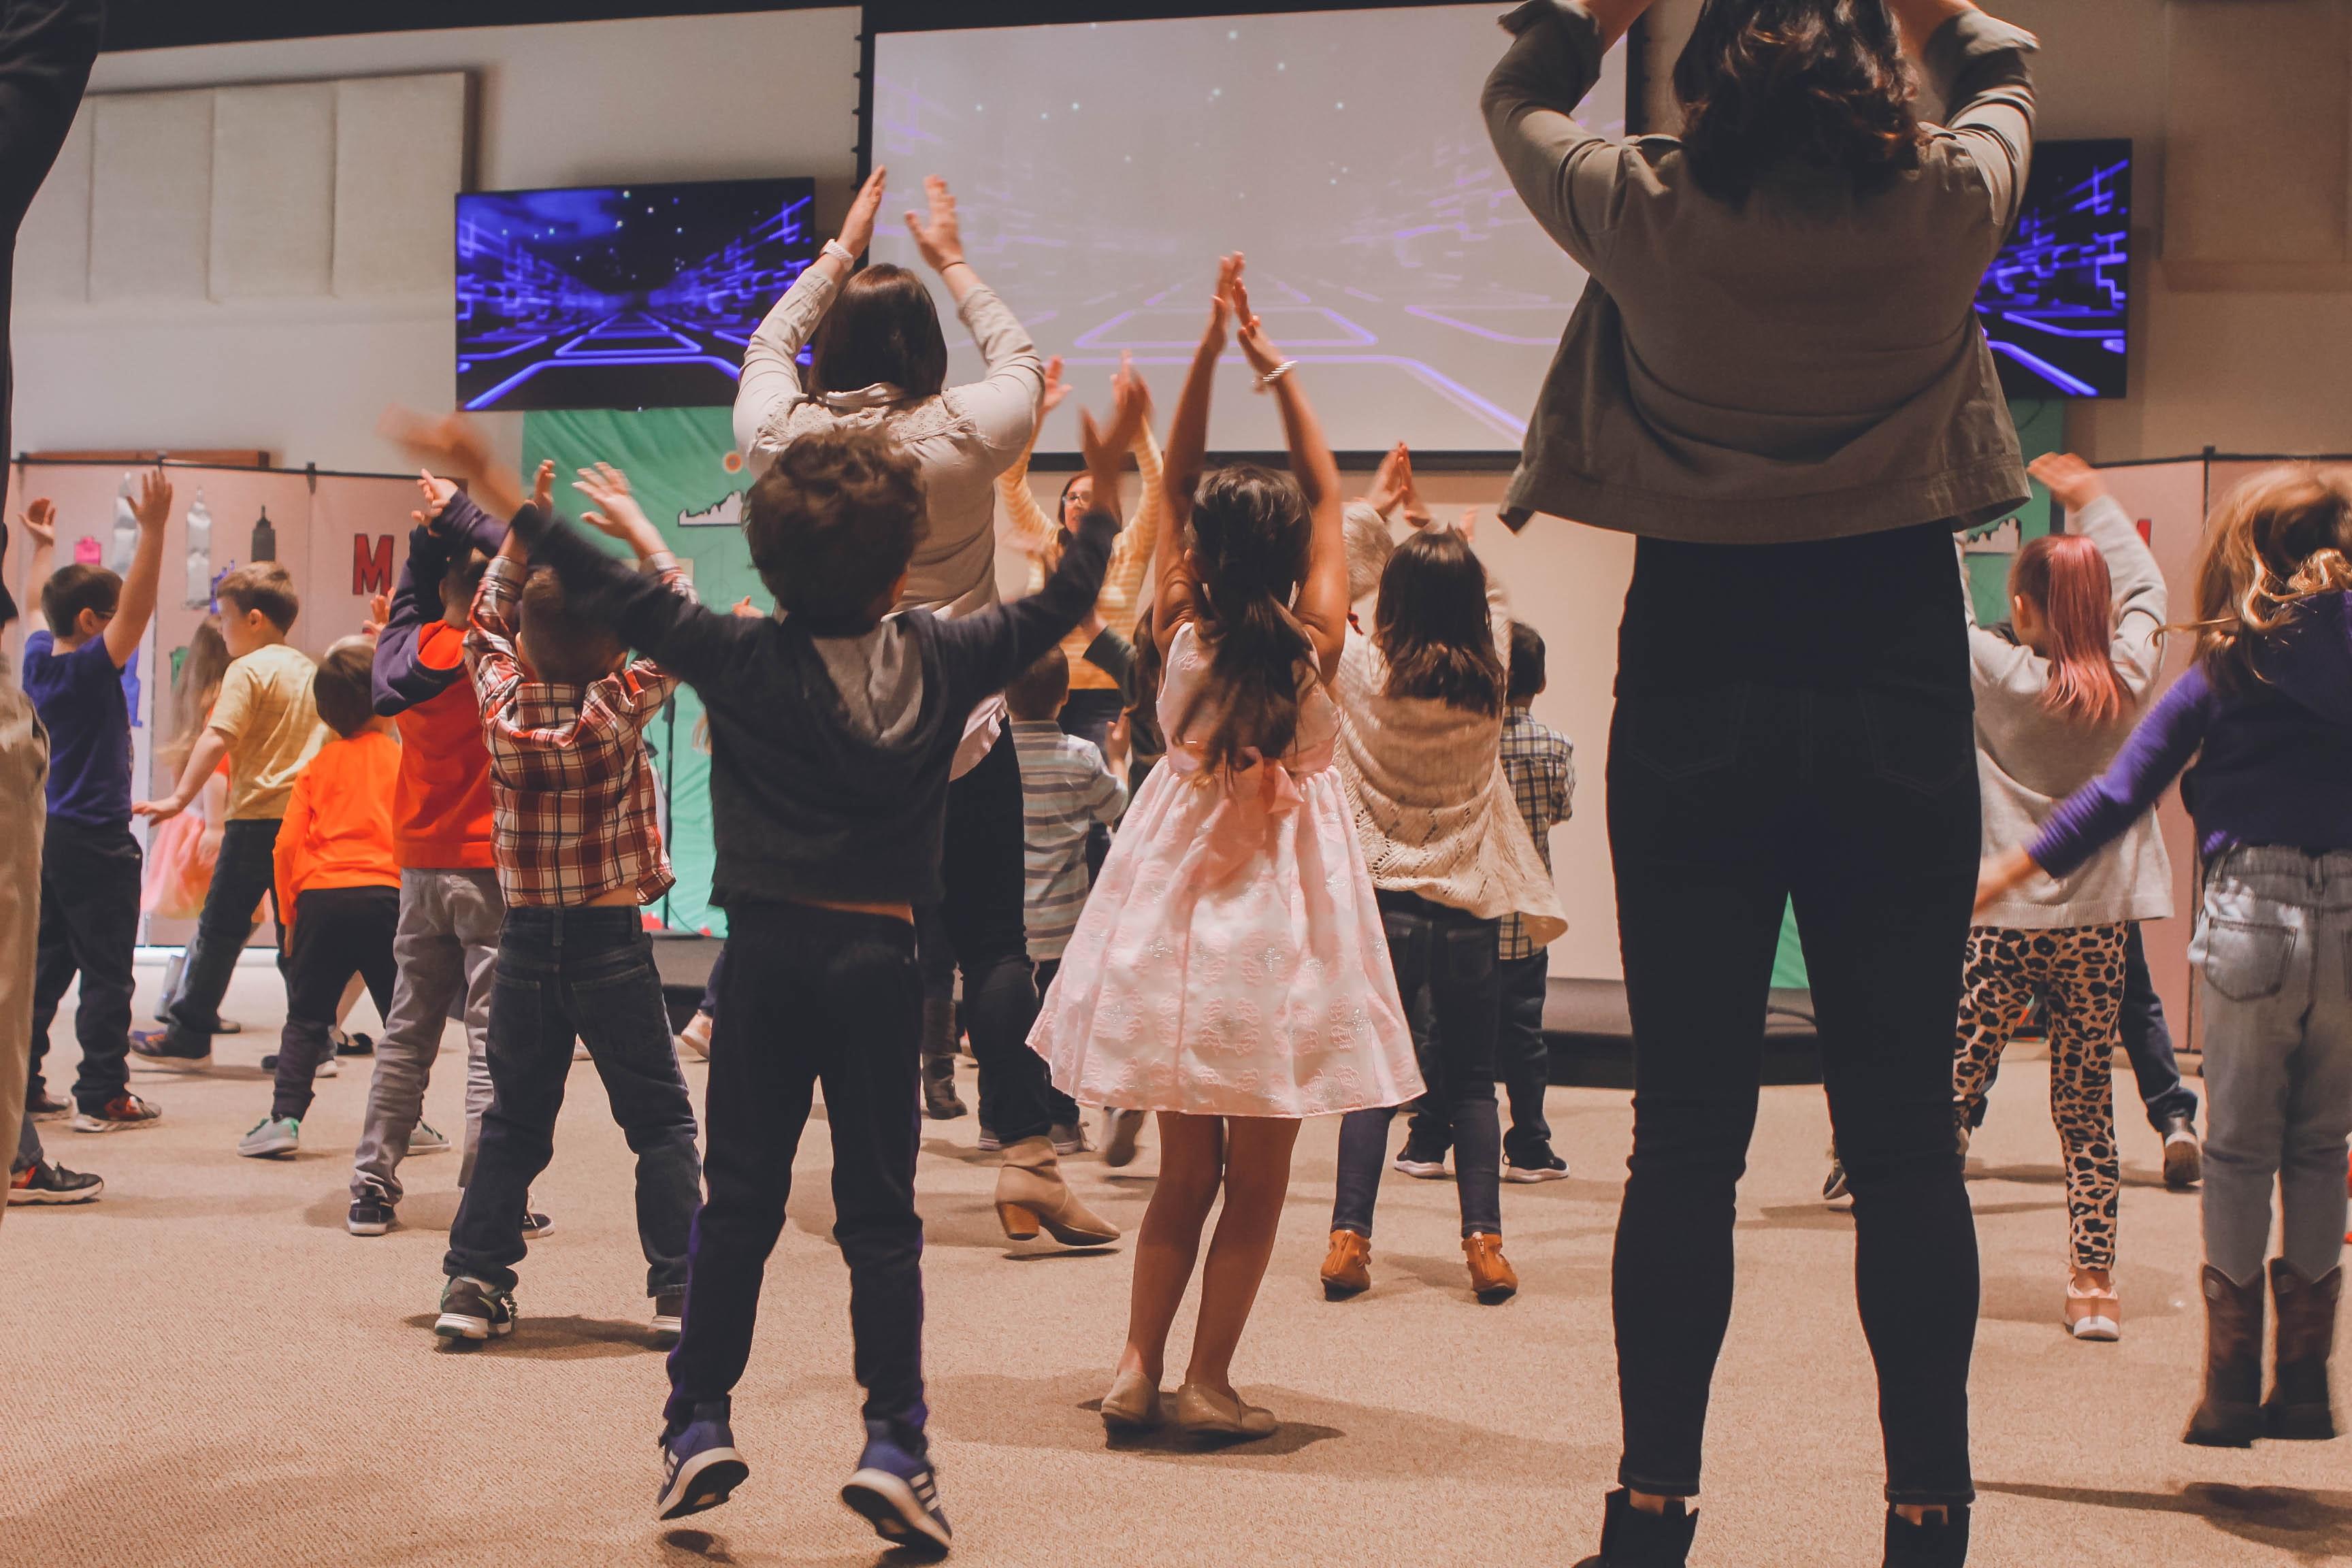 Child having fun during church event